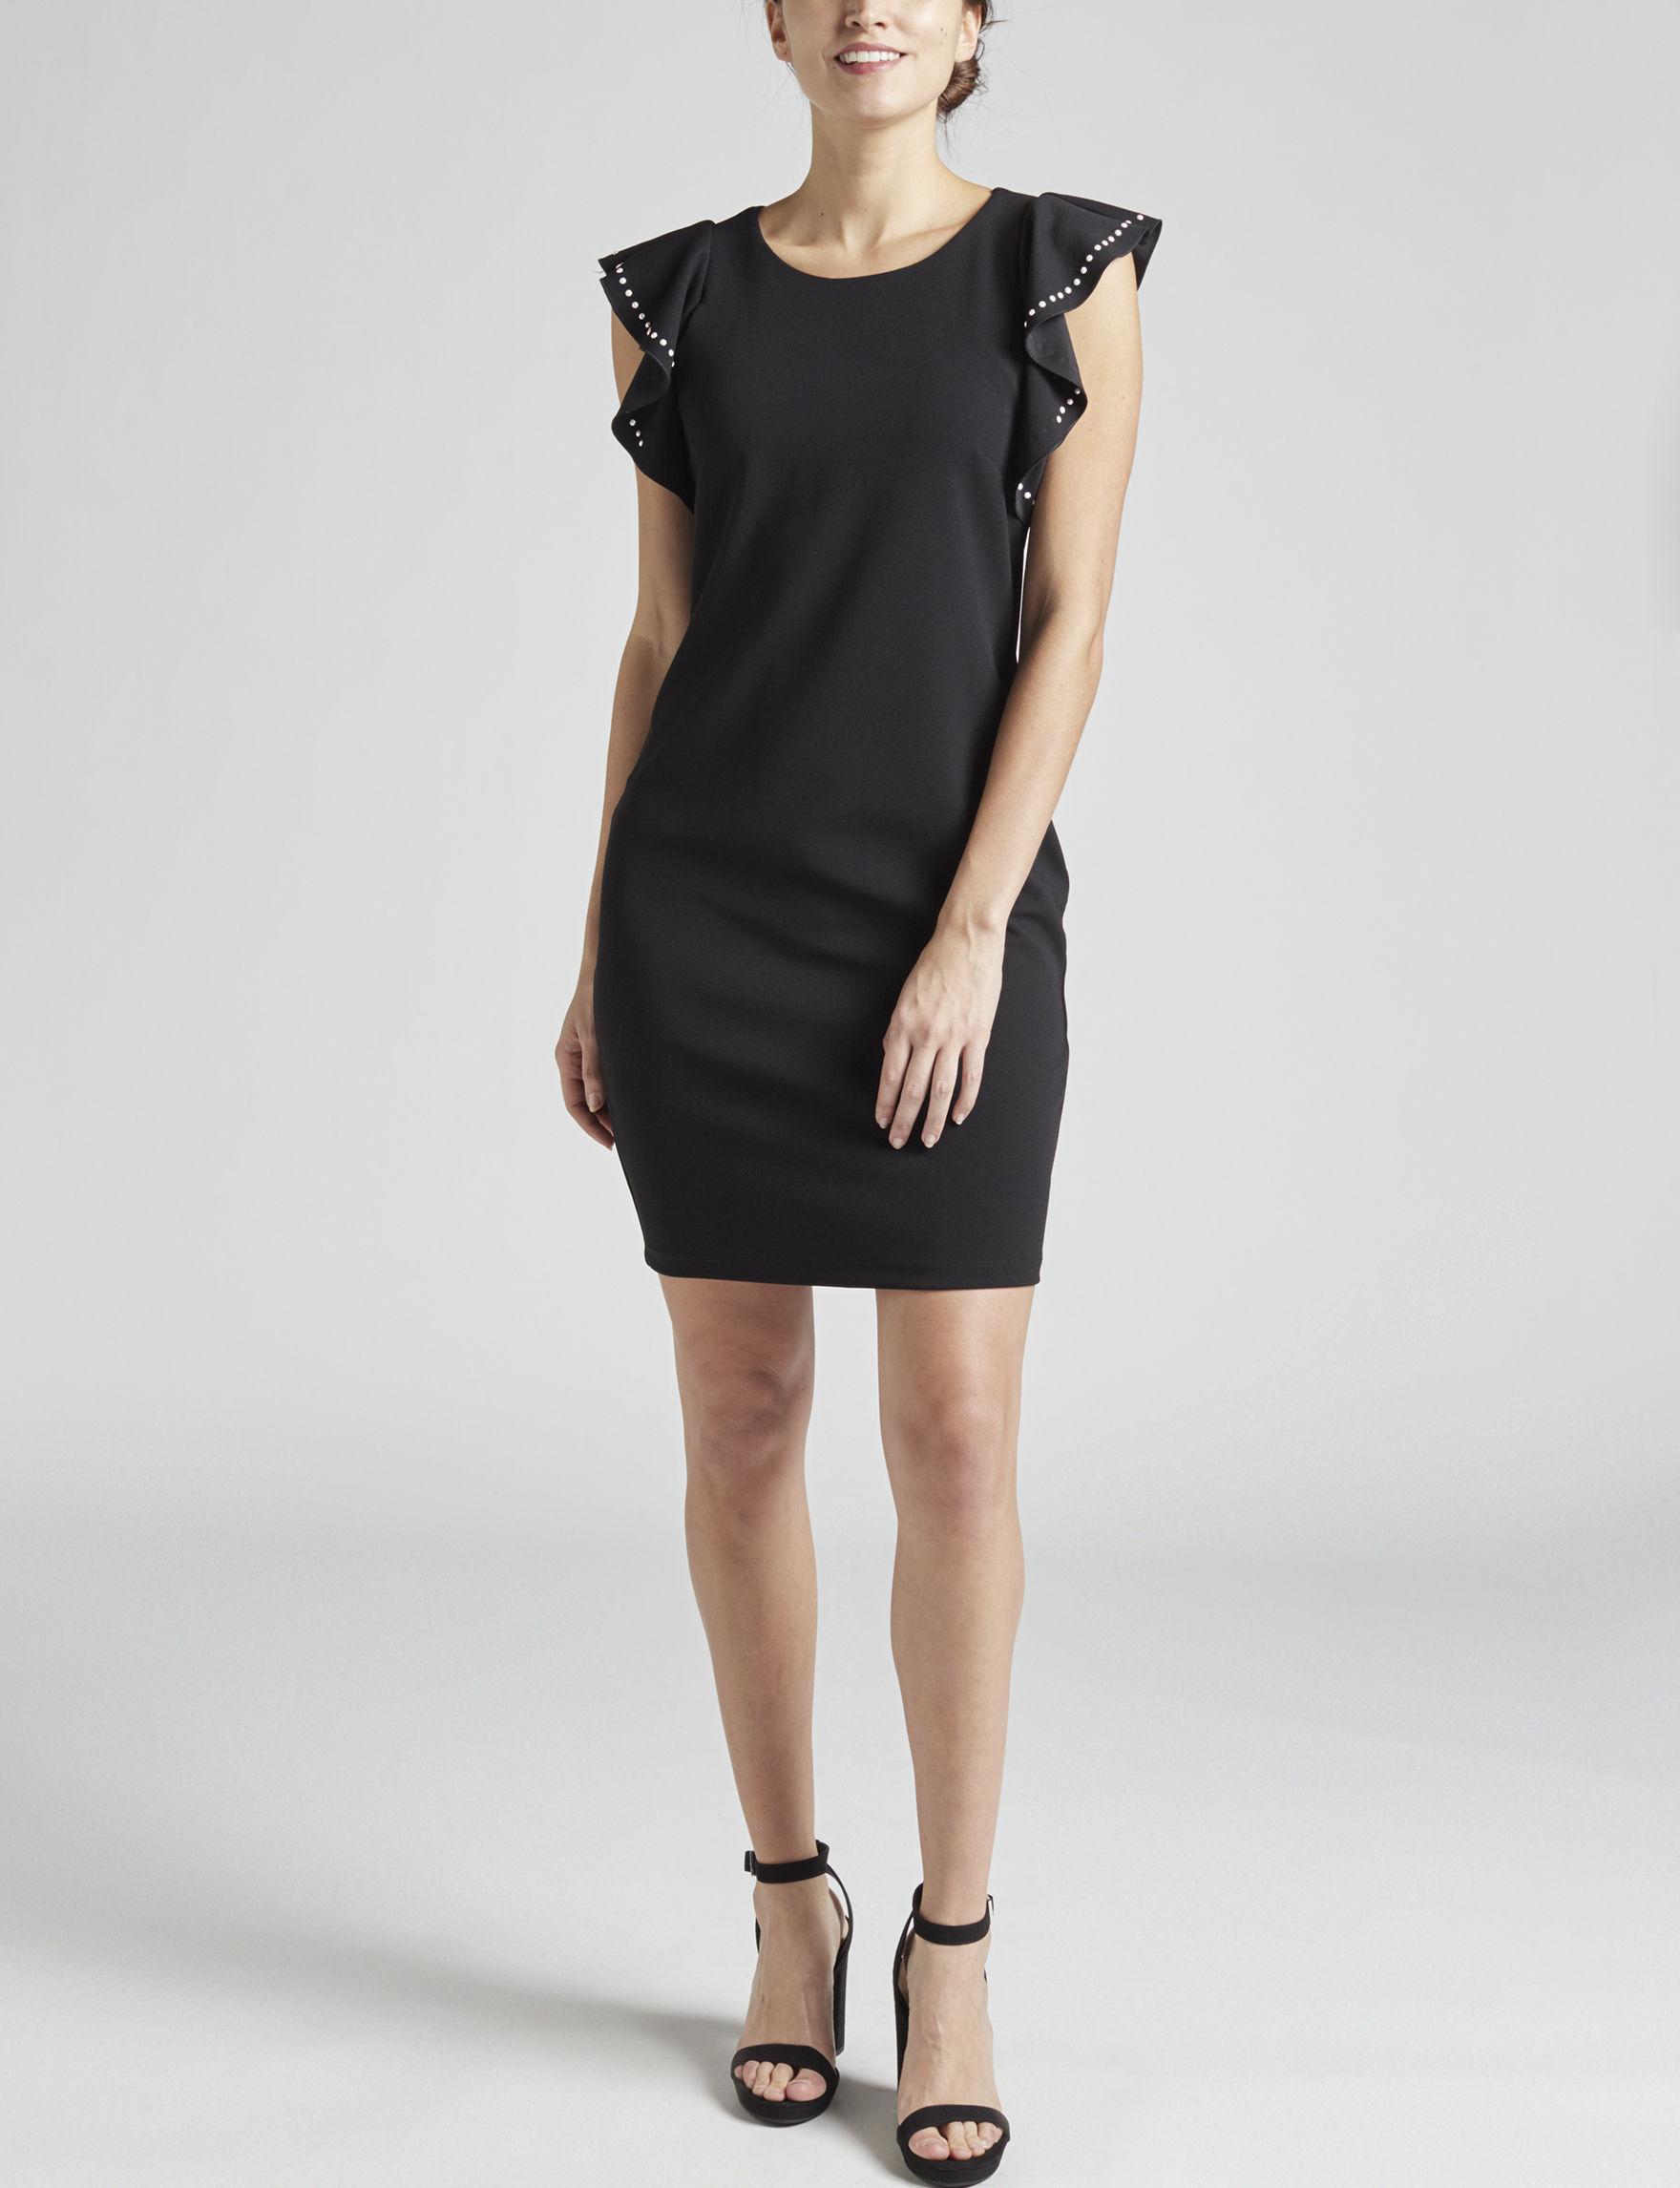 Bebe Black Cocktail & Party Evening & Formal Sheath Dresses